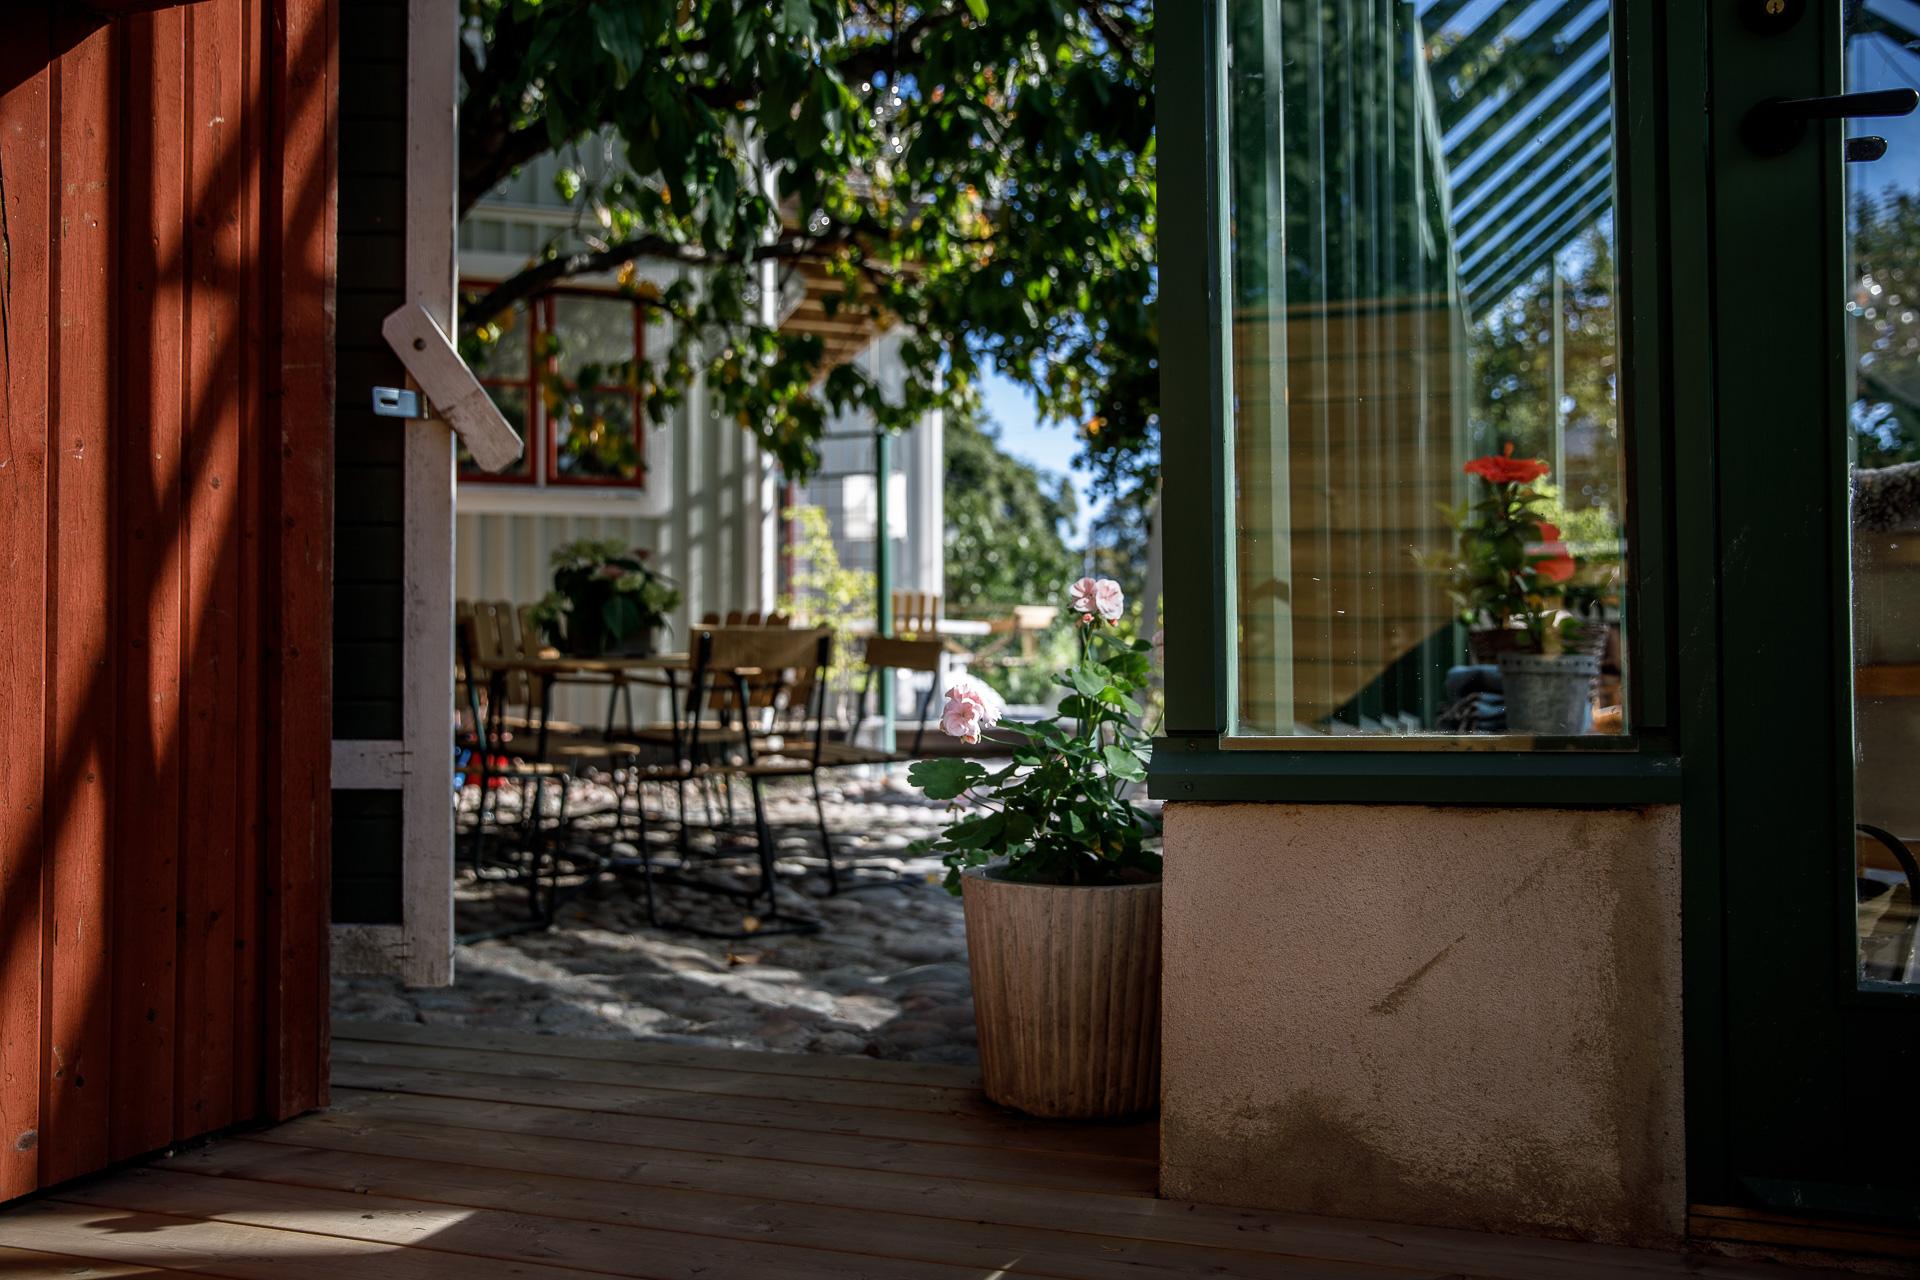 cafe (10 of 14).jpg